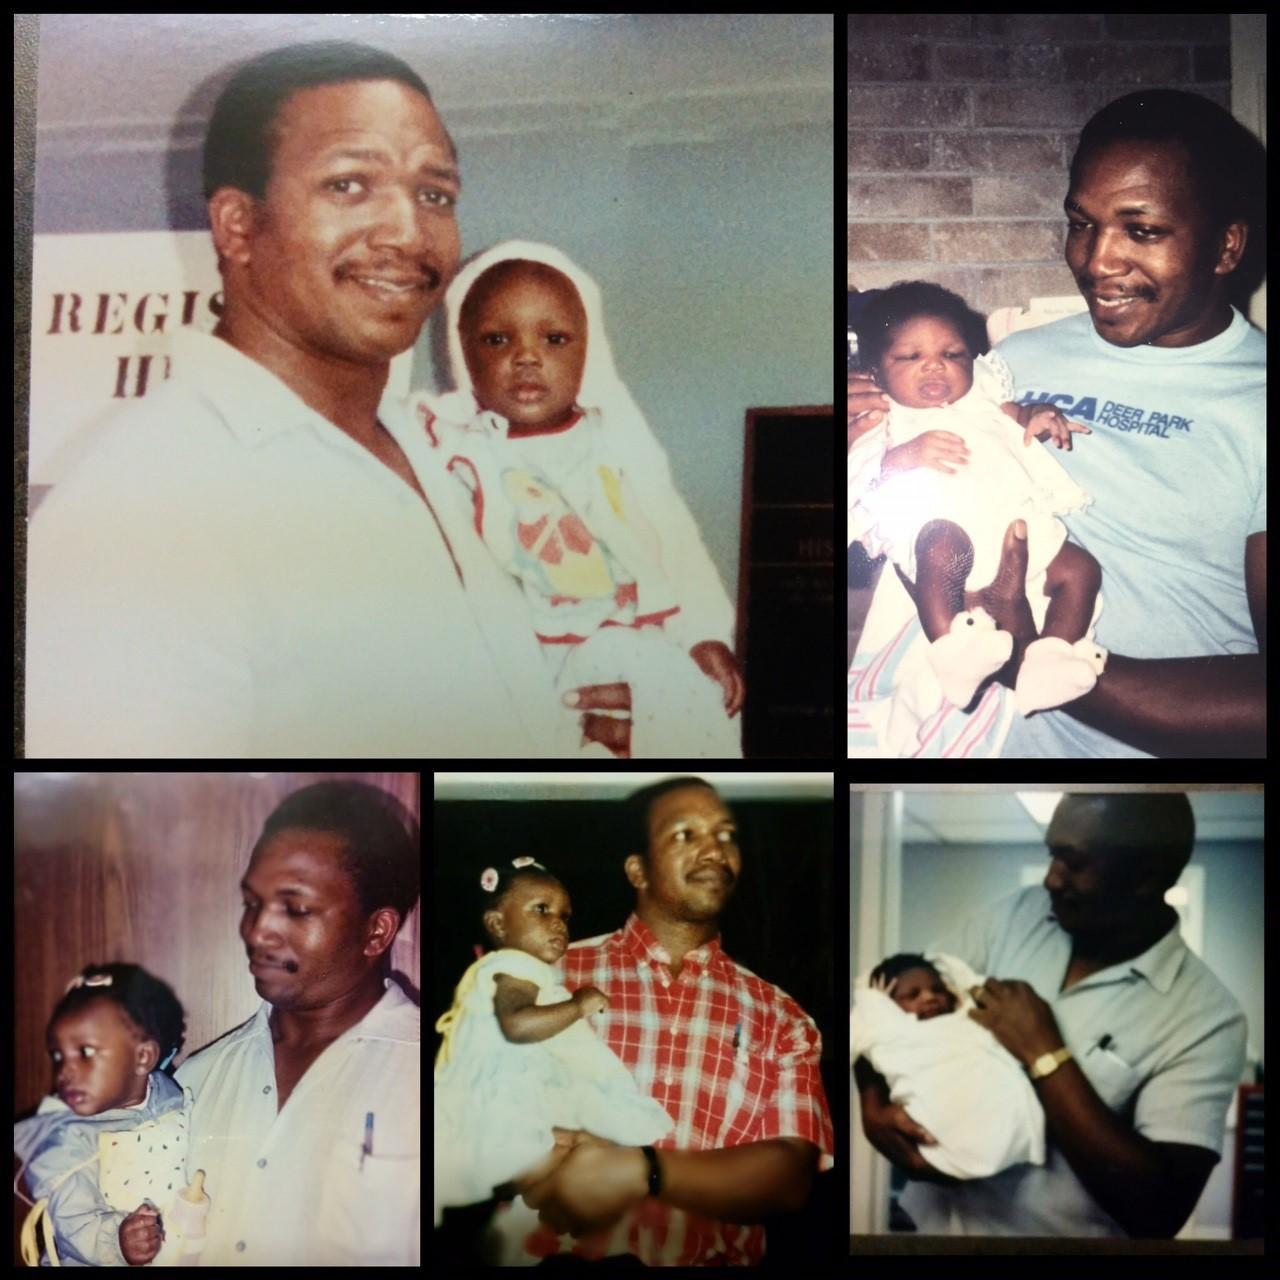 Freddie Evans Sr. August 18, 1952-August 30, 2014 Happy Father's Day!